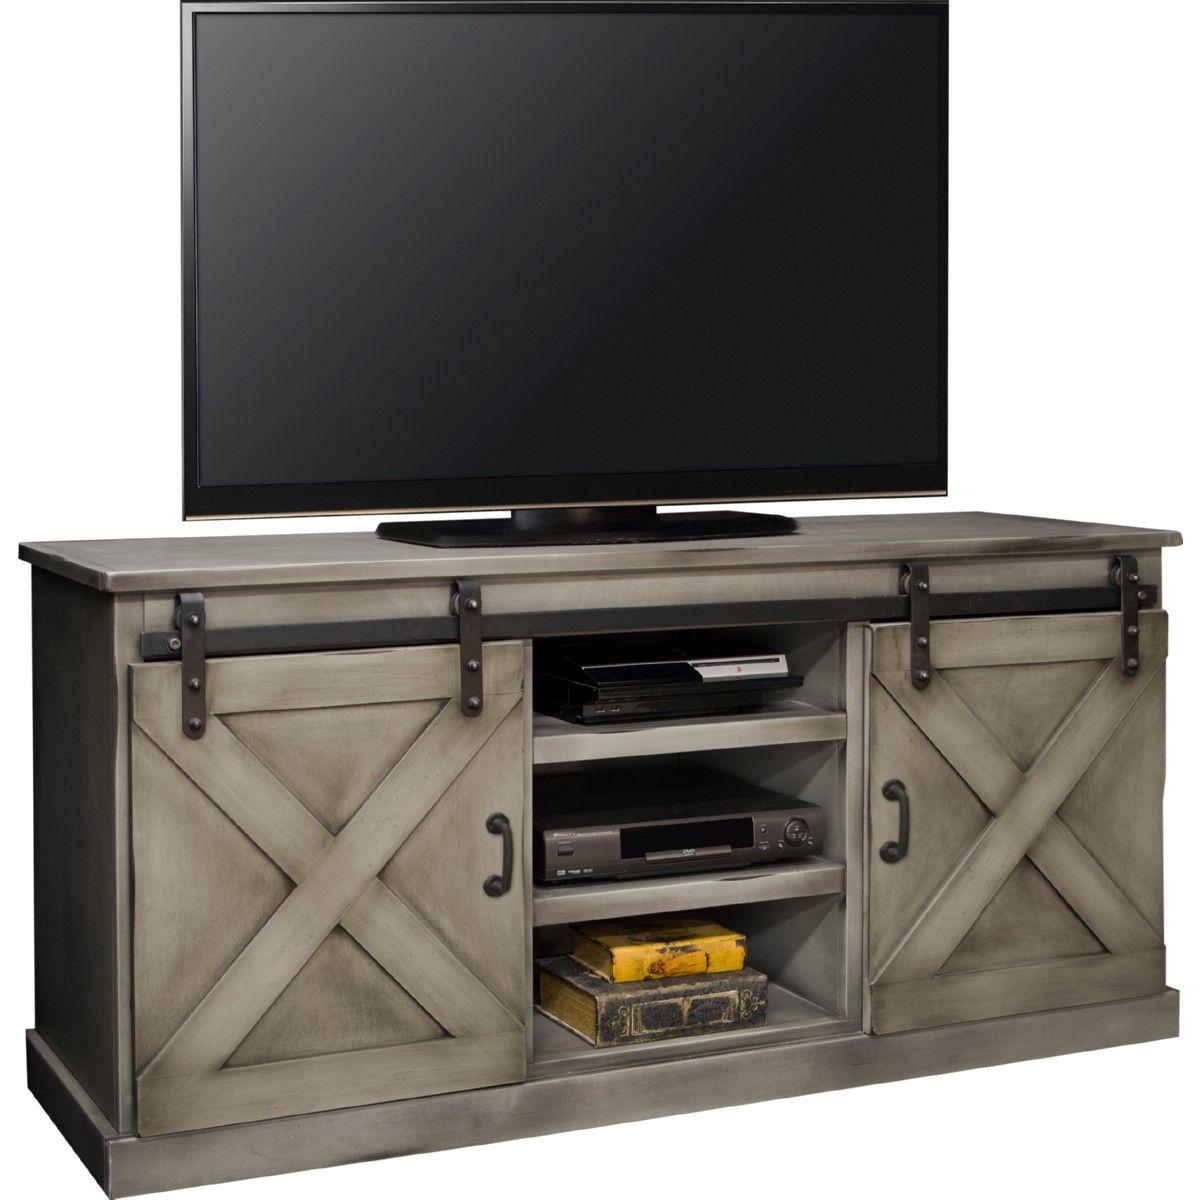 "Legends Furniture Farmhouse 66"" TV Stand Console in"